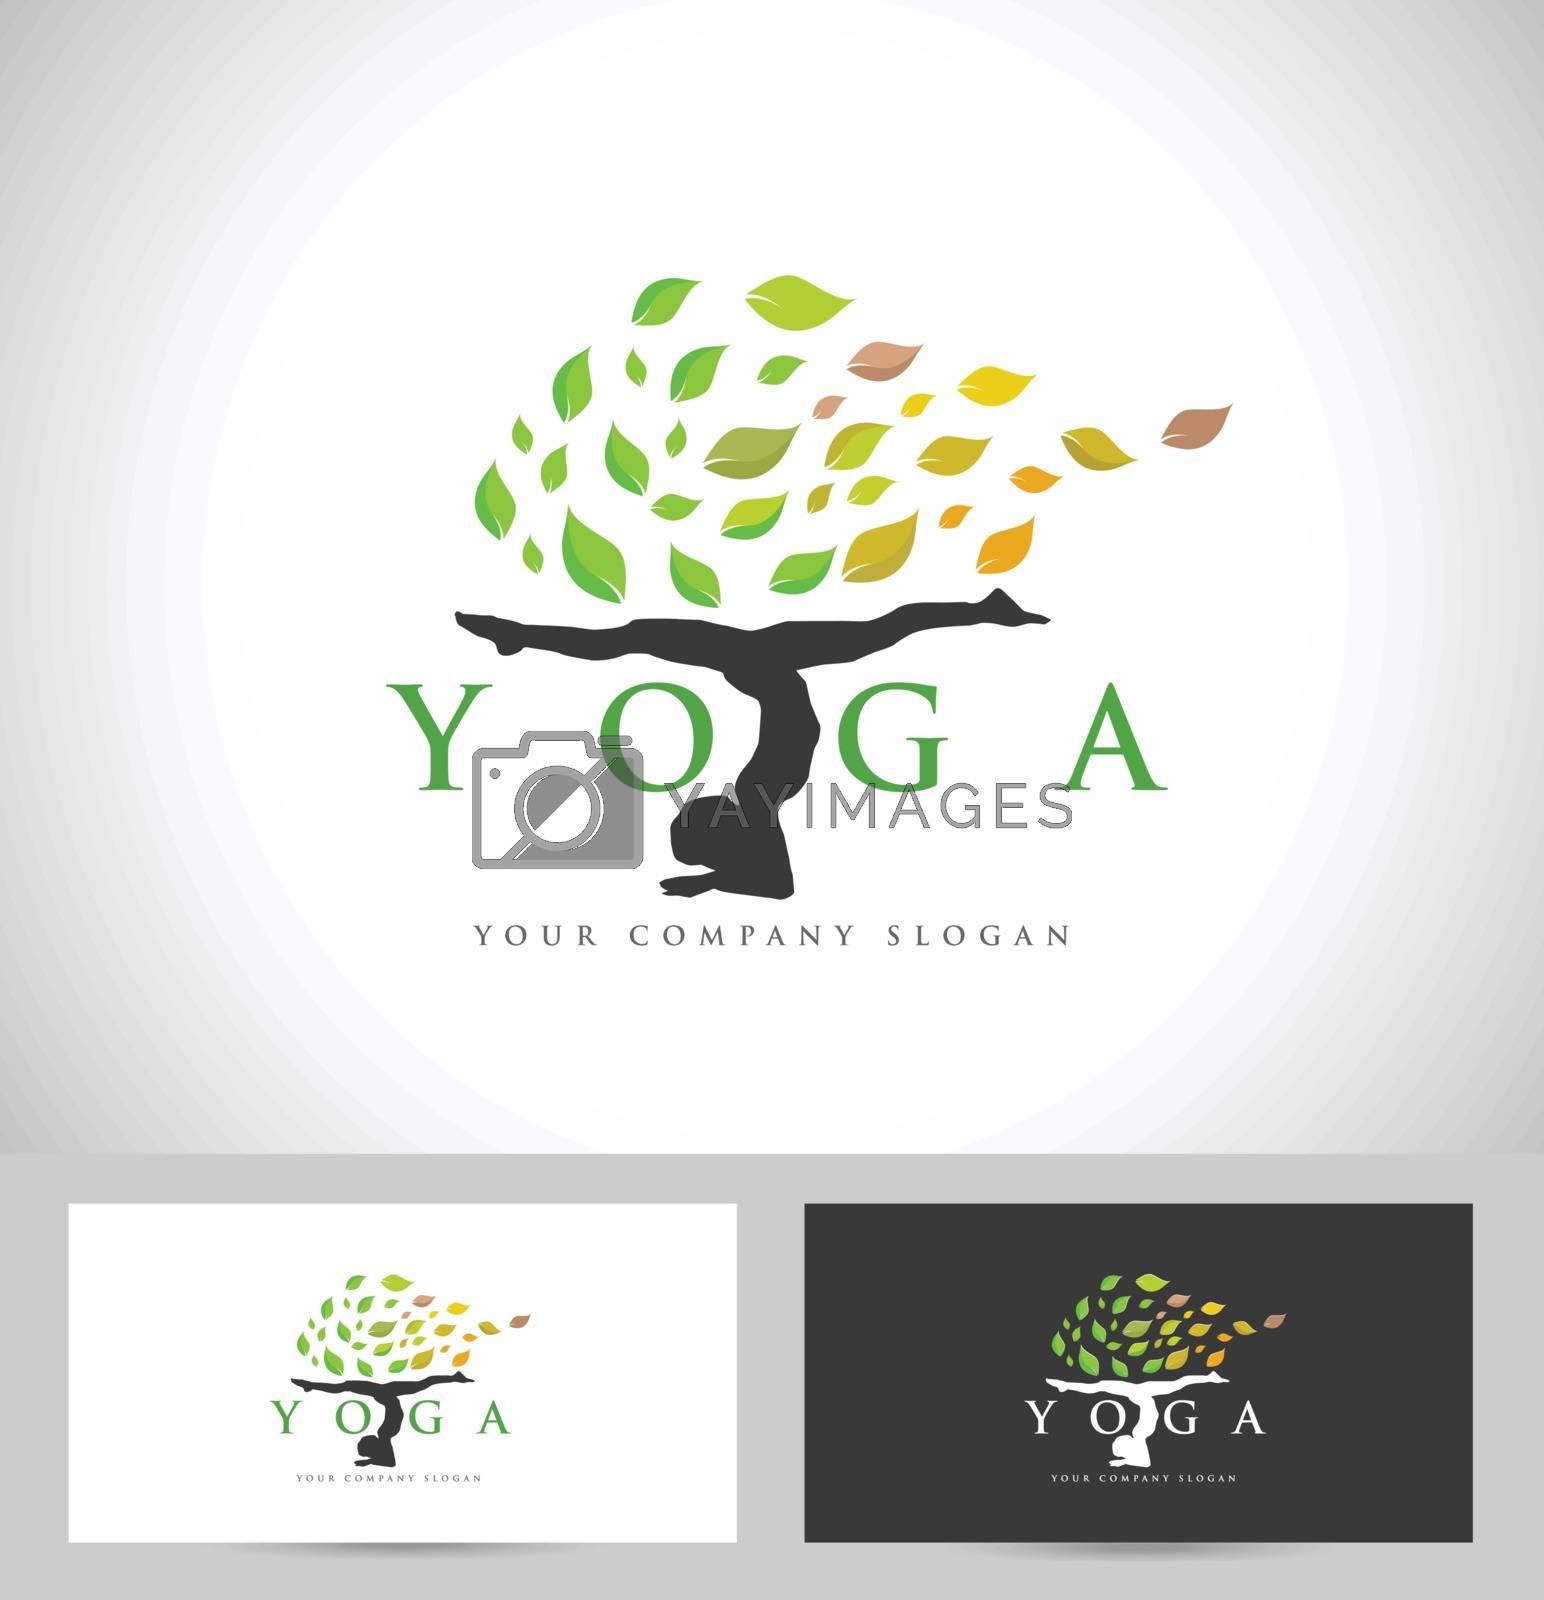 Yoga Logo Design. Creative Yoga Icon with Yoga Position